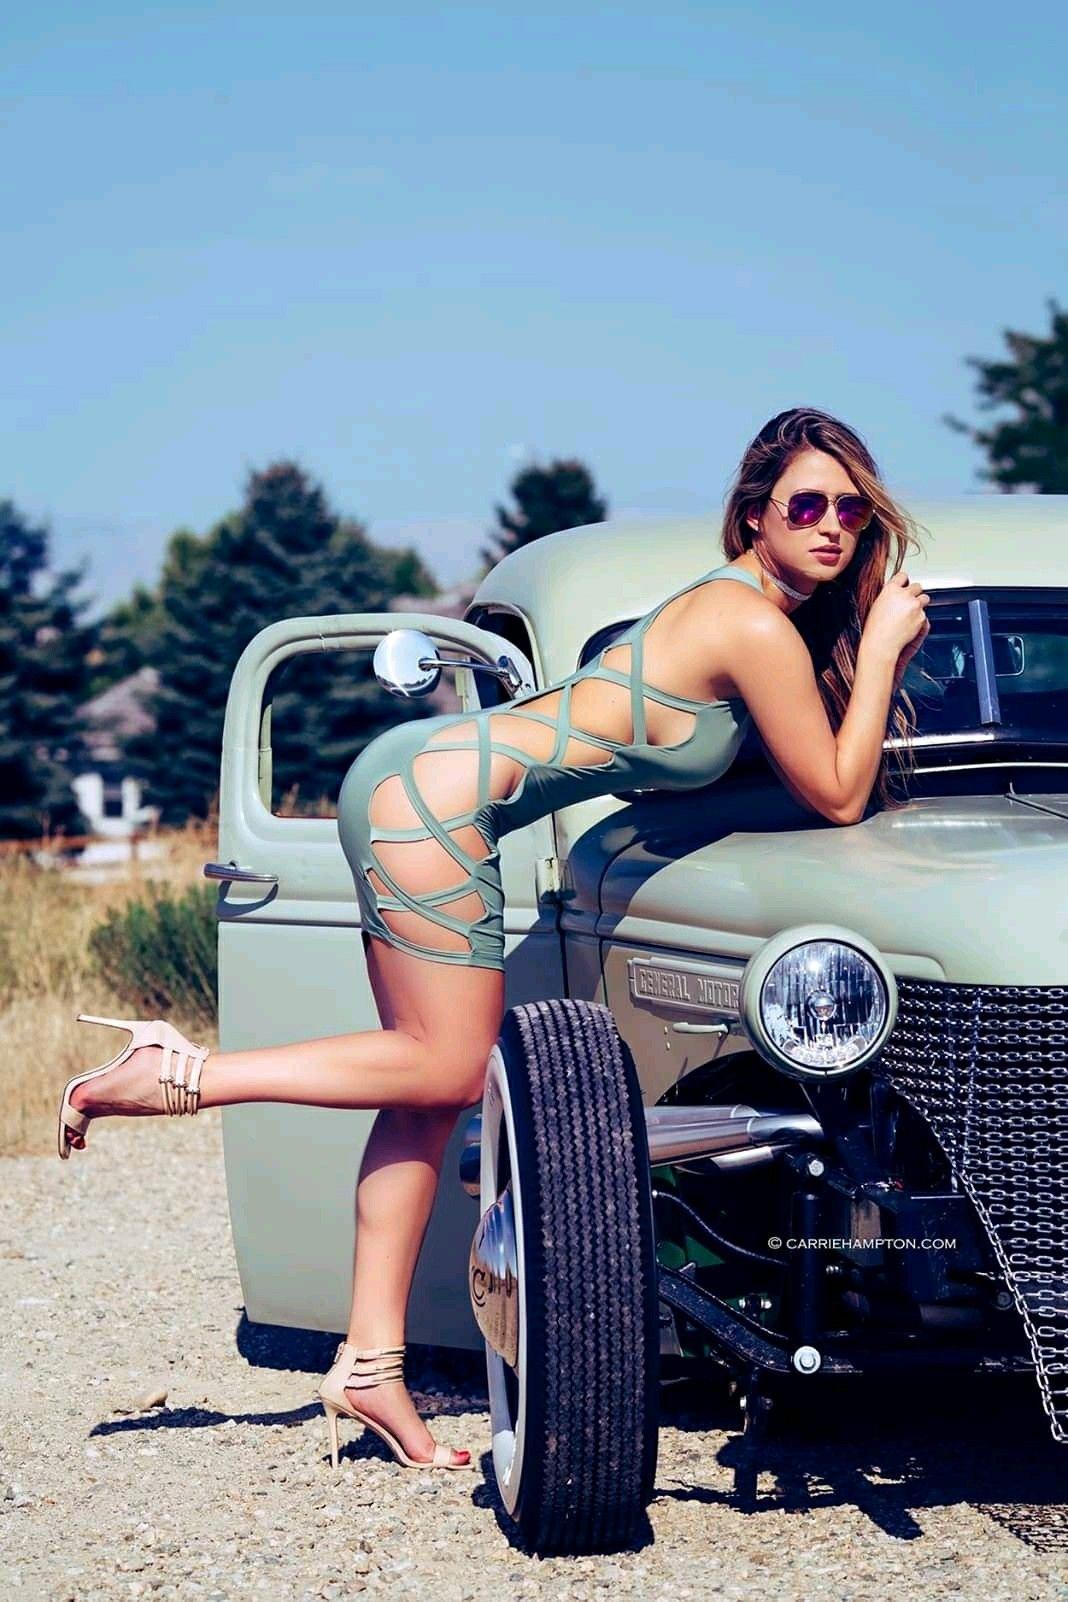 Edwige fenech nude in car taxi girl